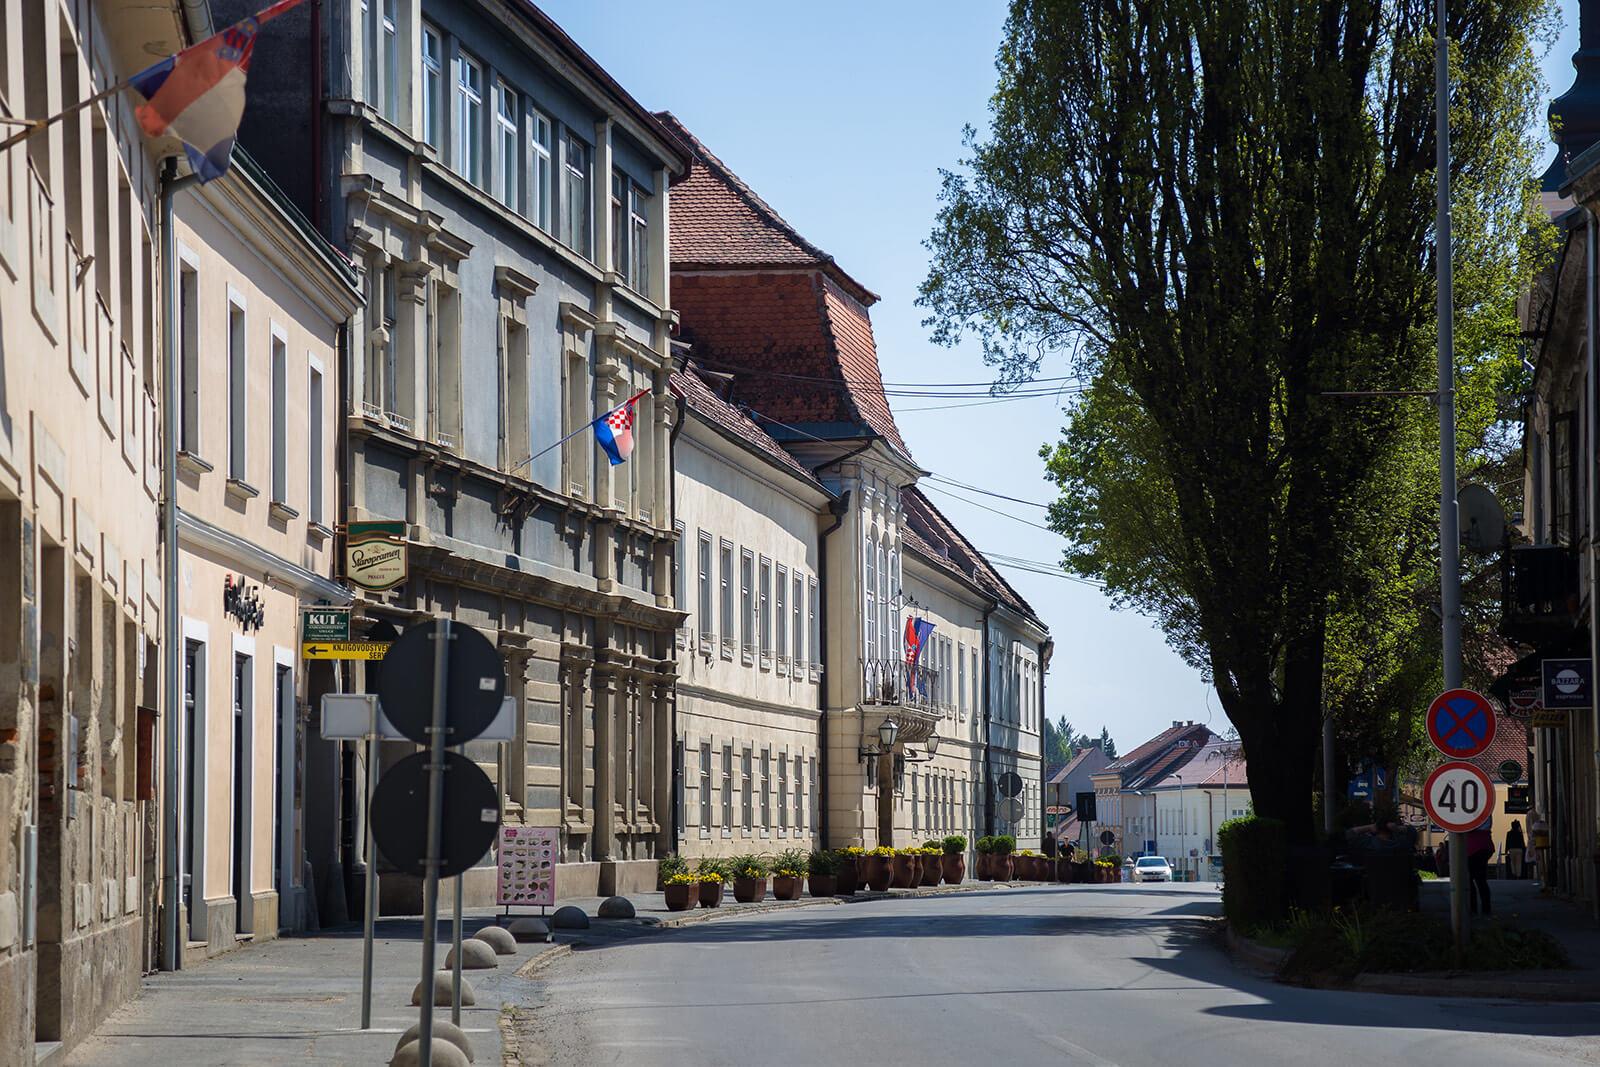 Županijska palača Križevci